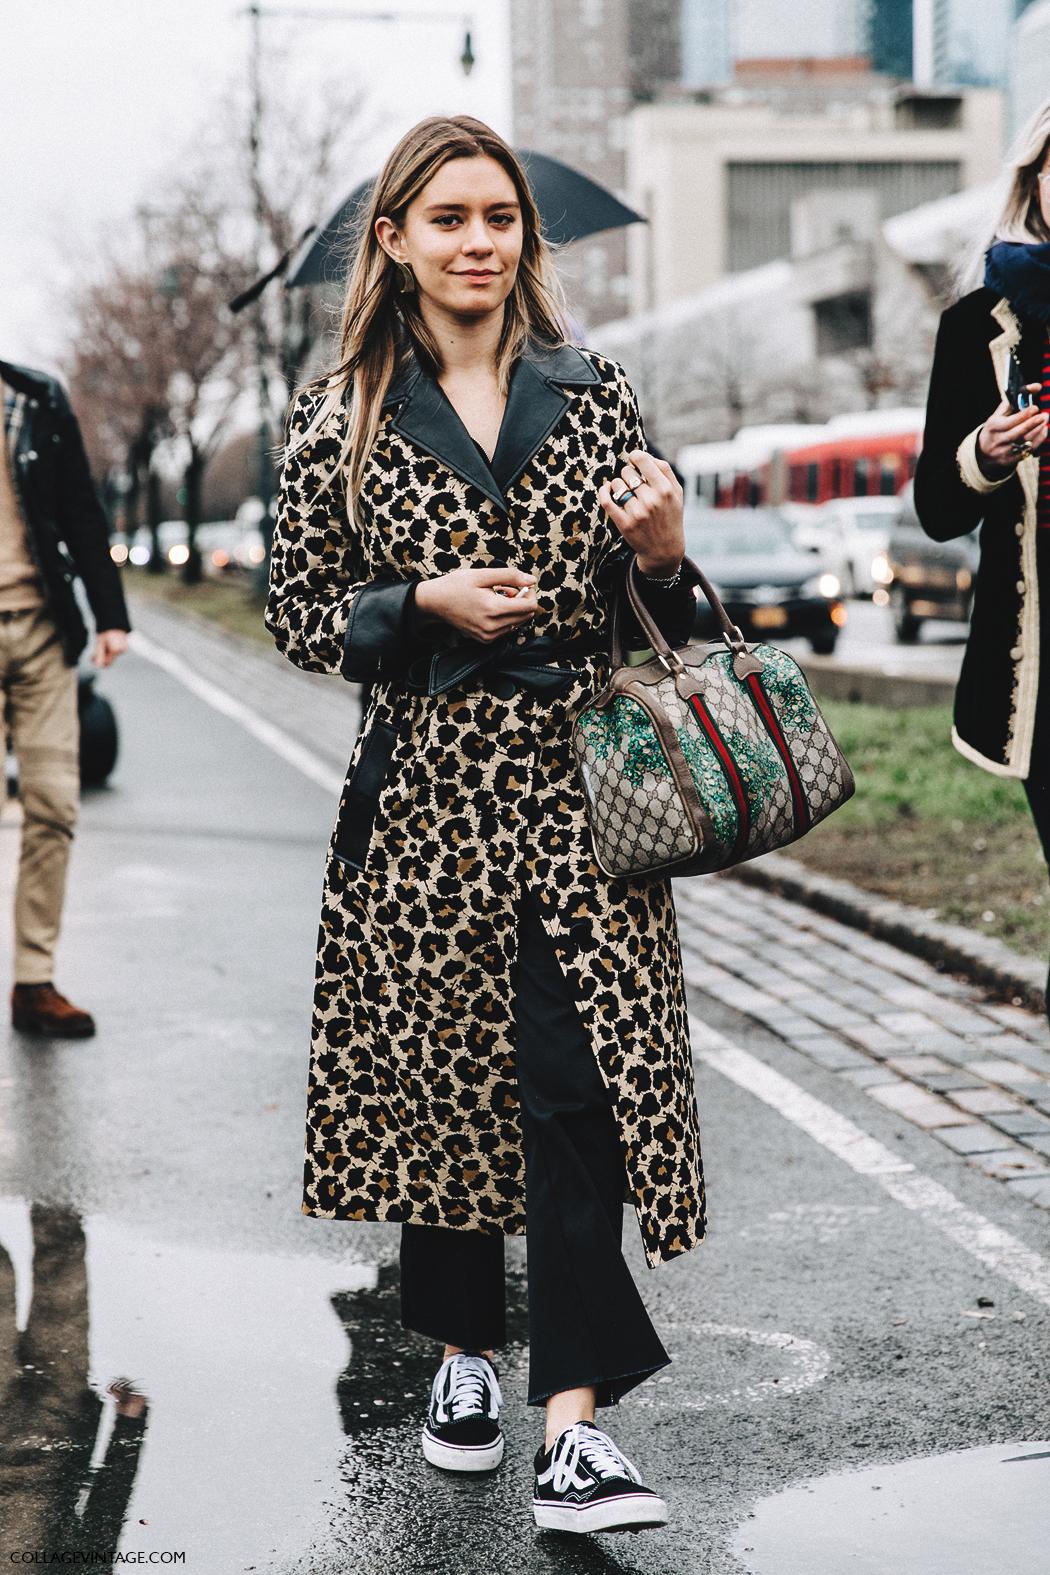 NYFW-New_York_Fashion_Week-Fall_Winter-17-Street_Style-Emma_Morrison-Leopard_Coat-Gucci_Bag-2